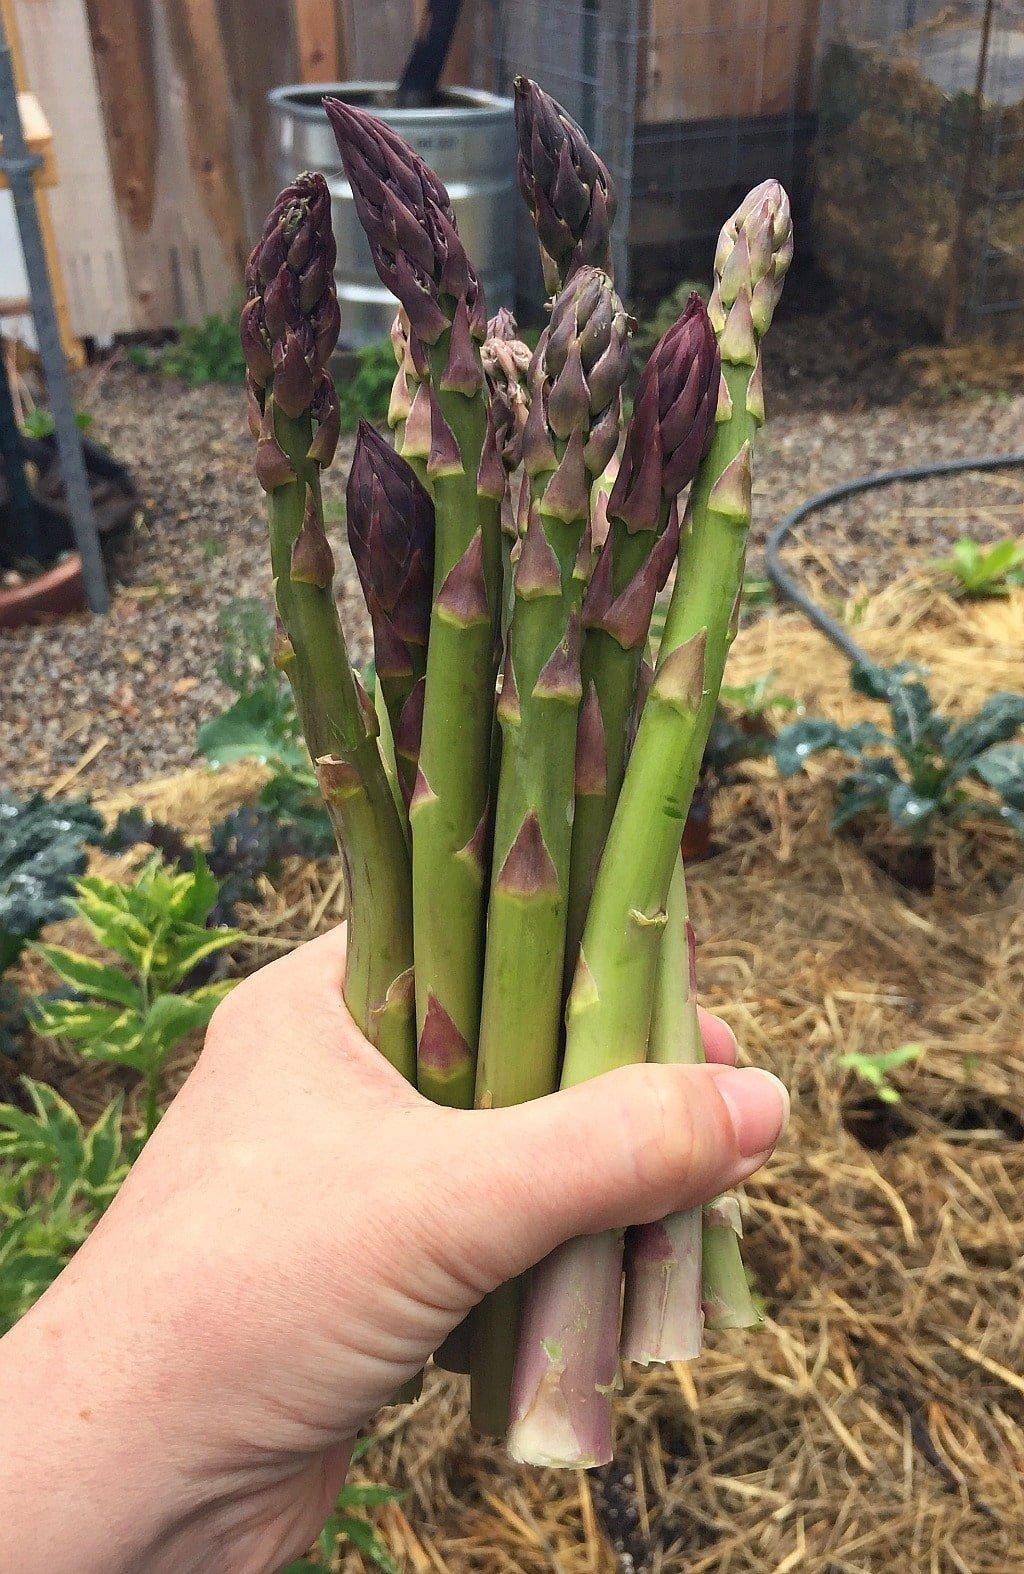 a hand holding fresh asparagus